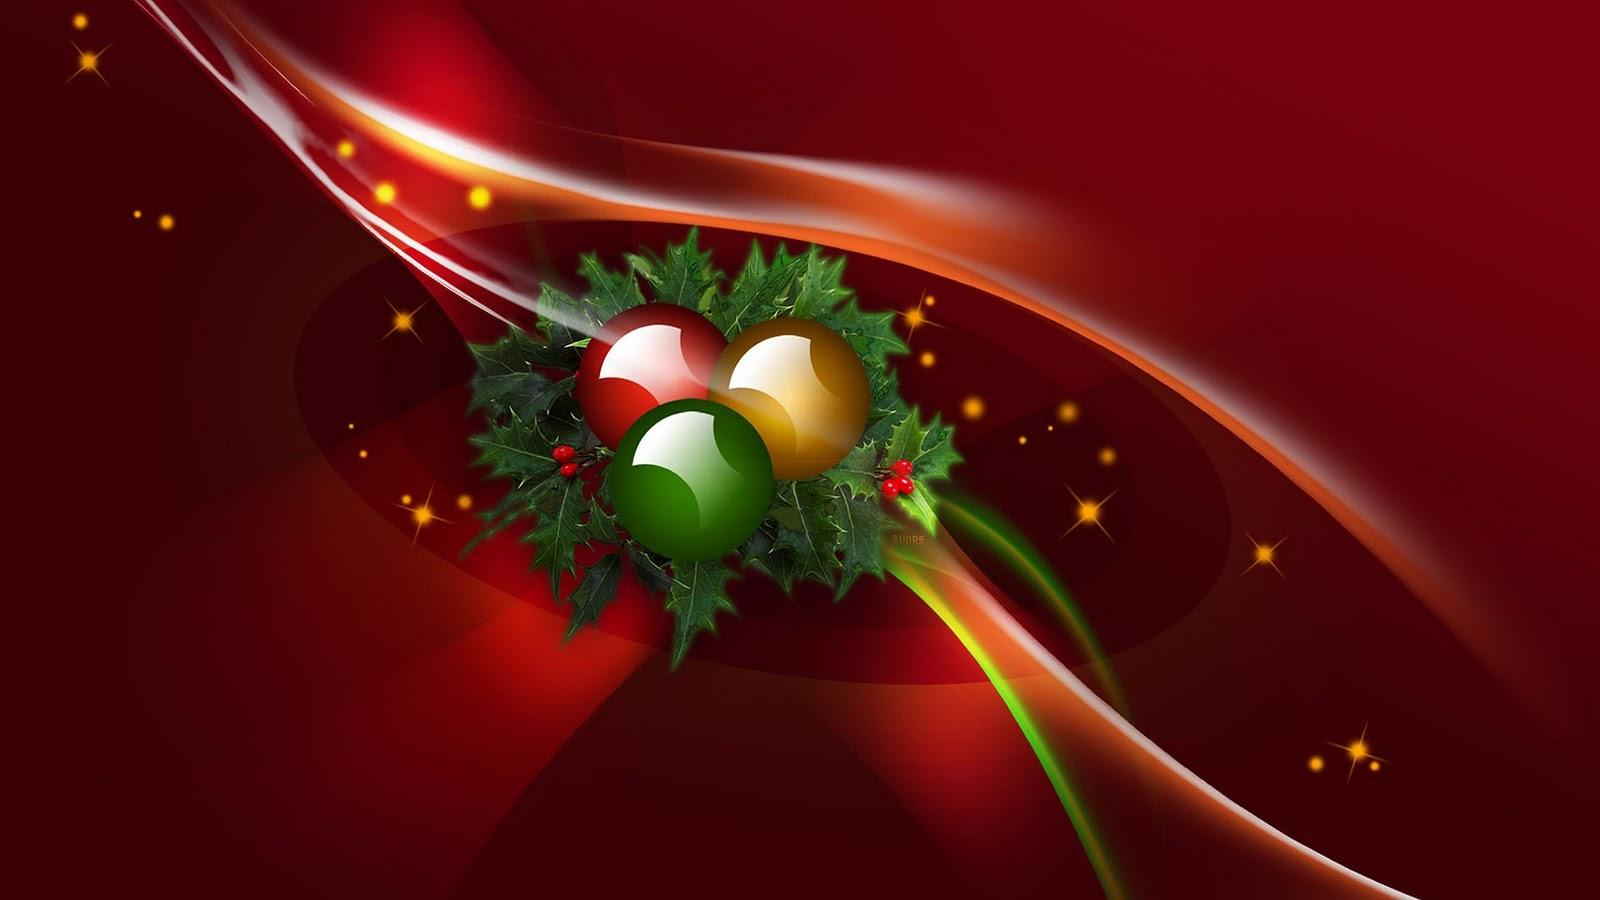 http://3.bp.blogspot.com/-_Nv7s8MqDm8/Tqq7vb-l0fI/AAAAAAAAPAM/_8j9M9twpaA/s1600/Mooie-kerst-achtergronden-leuke-hd-kerst-wallpapers-afbeelding-plaatje-foto-26.jpg